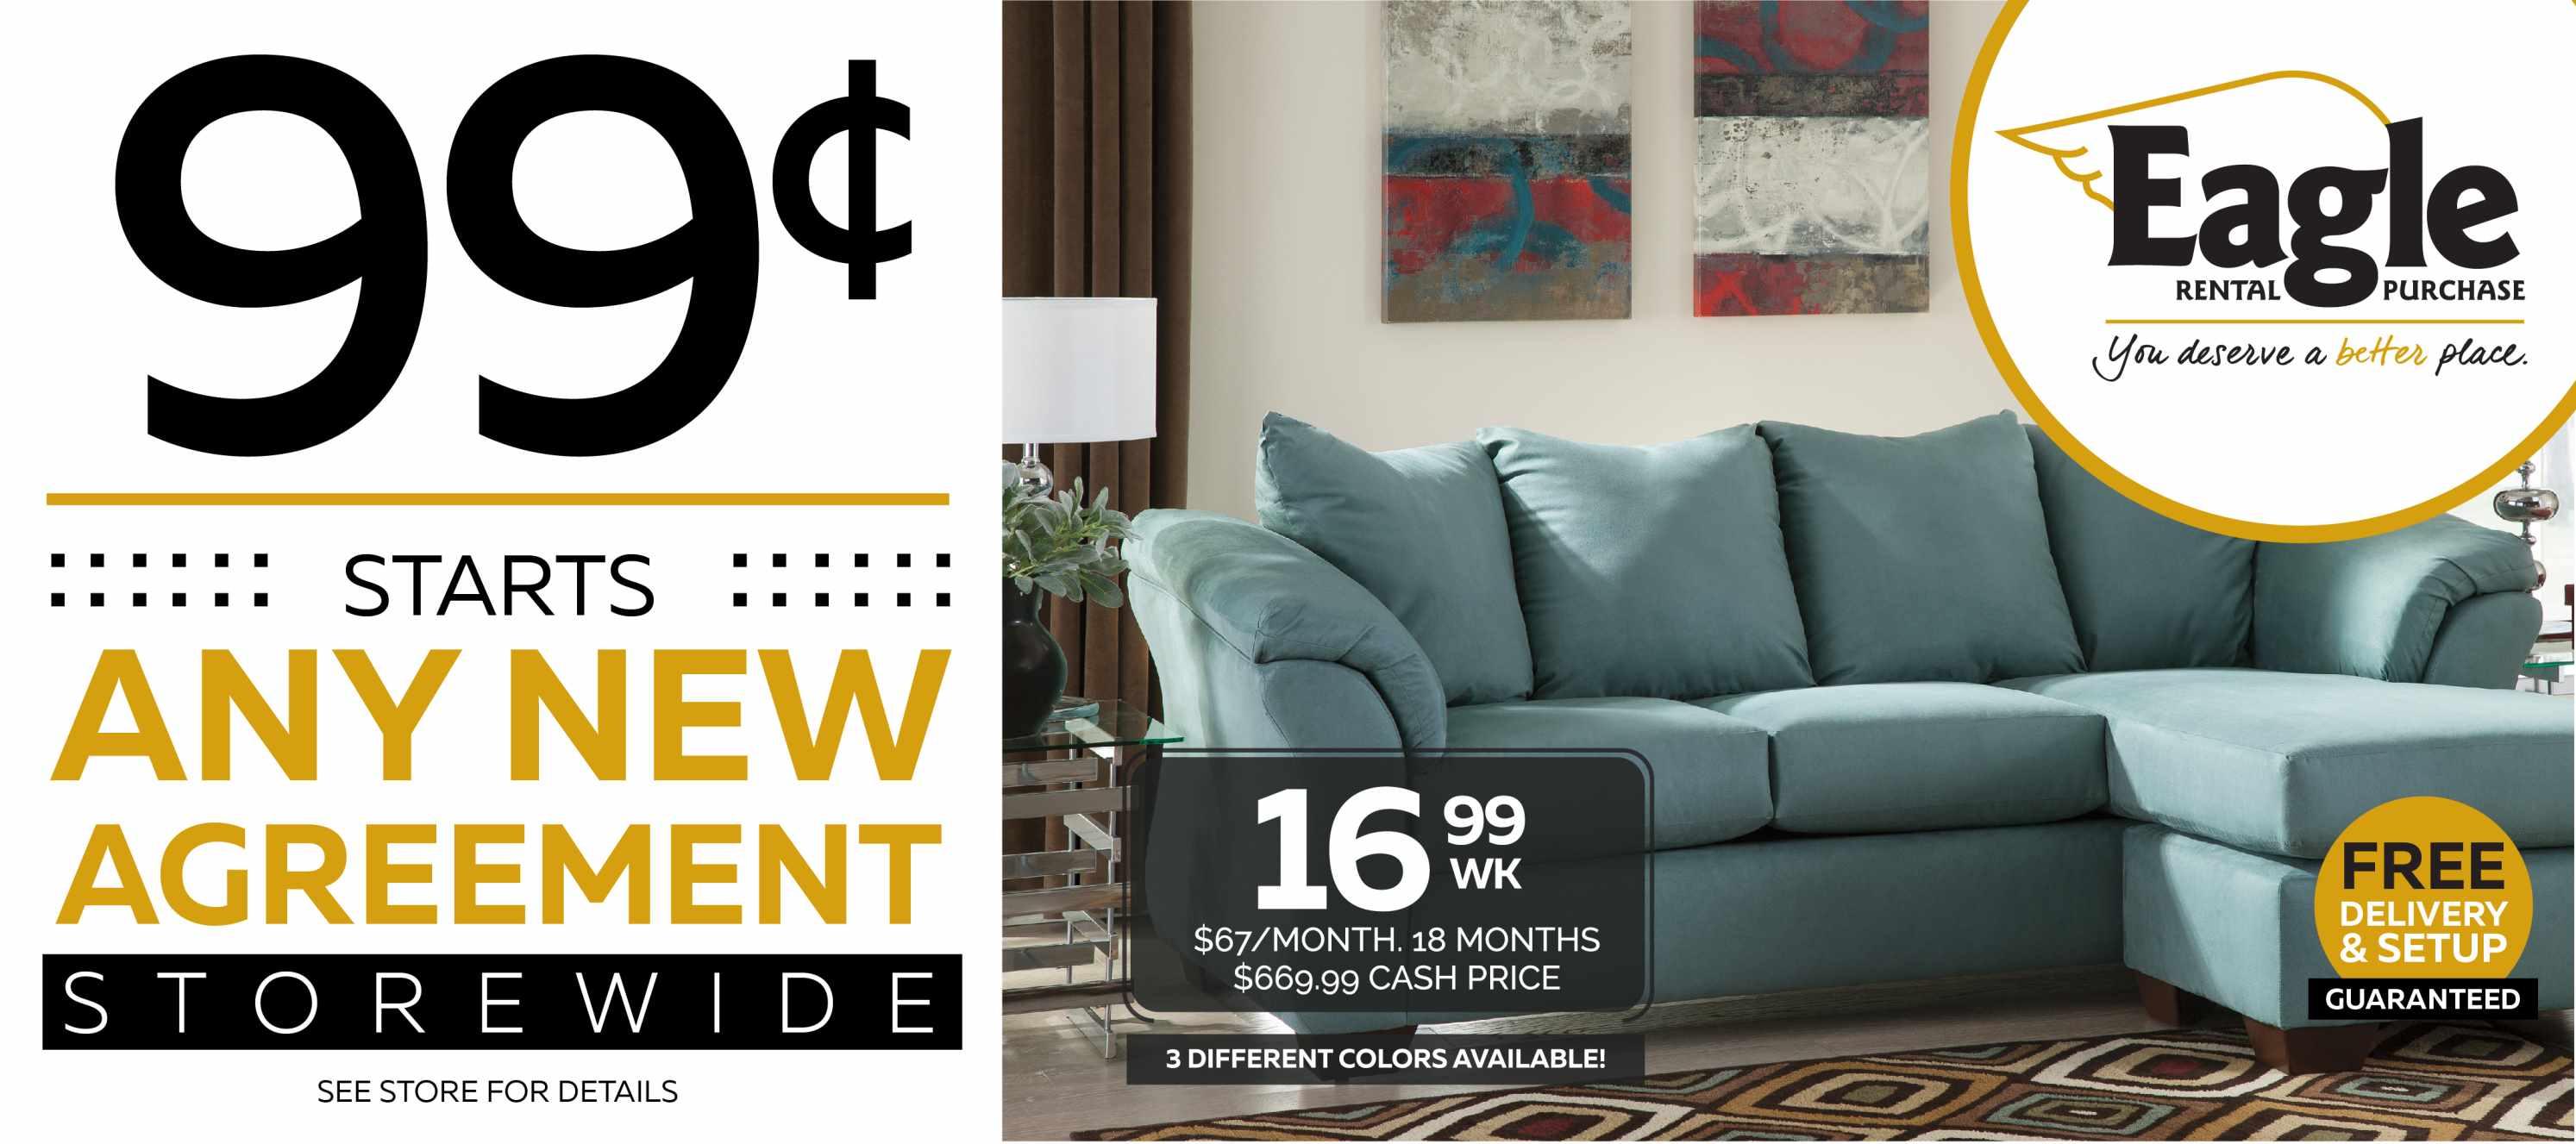 Furniture Appliances Electronics More Eagle Rental Near Me Eagle Rental Purchase